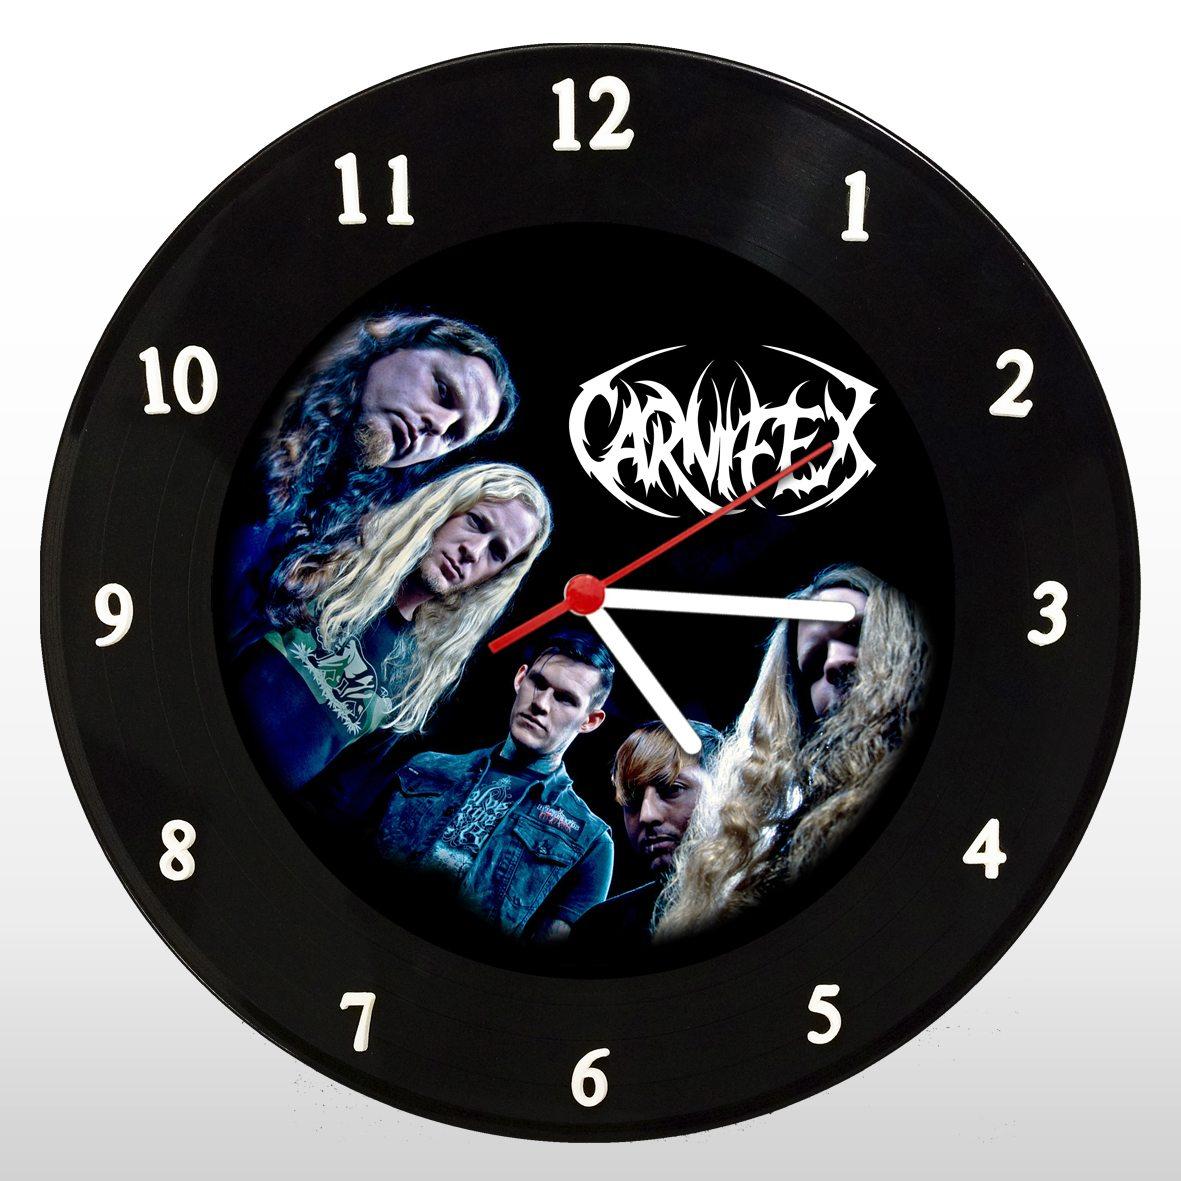 Carnifex - Relógio de Parede em Disco de Vinil - Mr. Rock